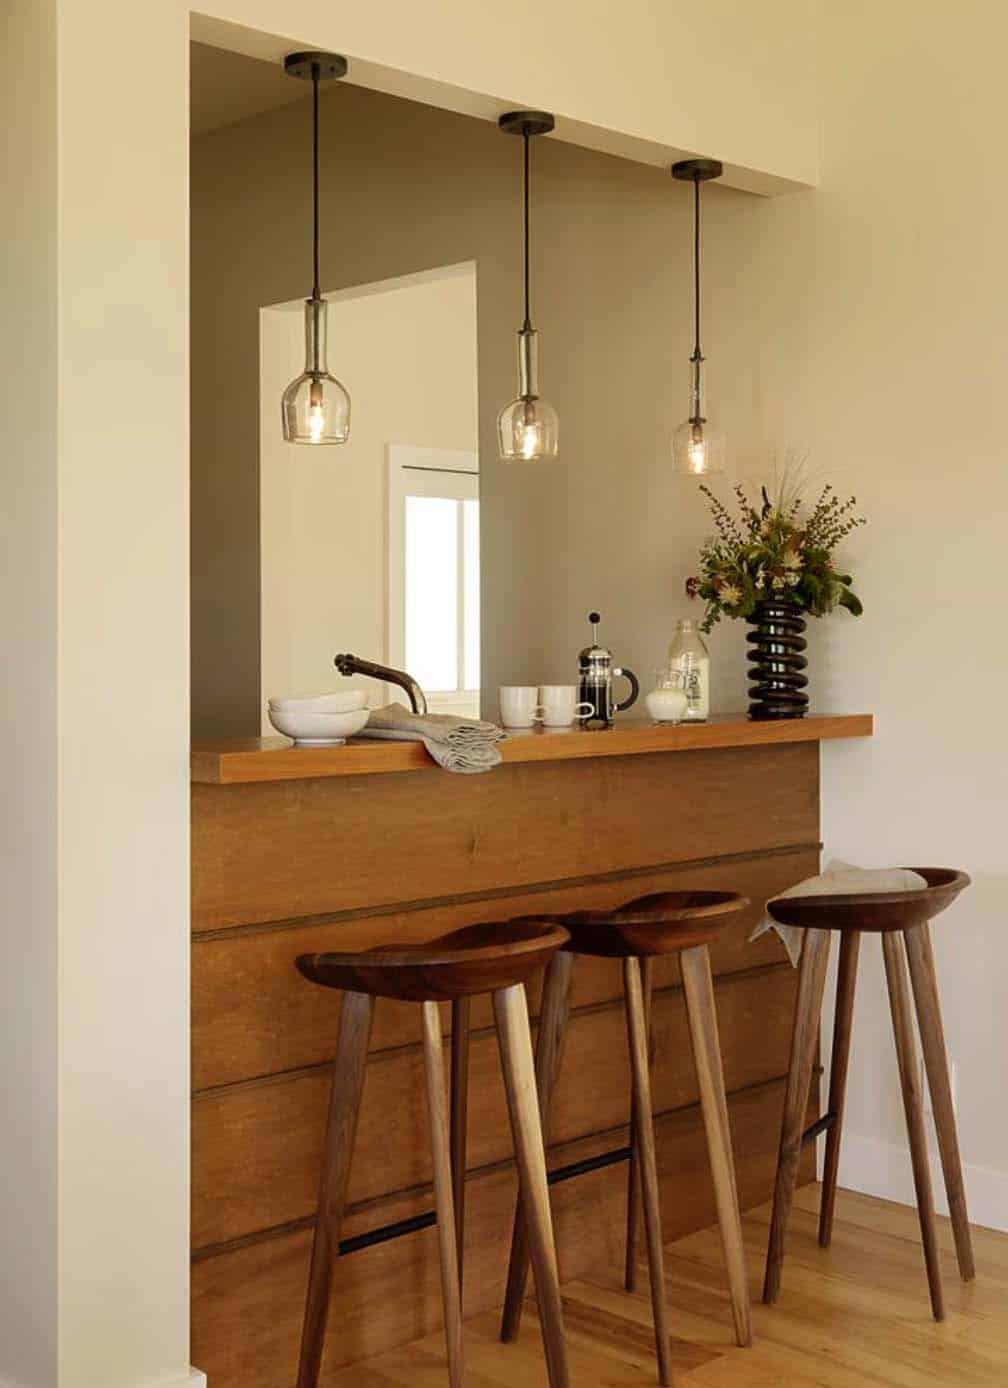 Design d'intérieur contemporain-Jute Interior Design-06-1 Kindesign